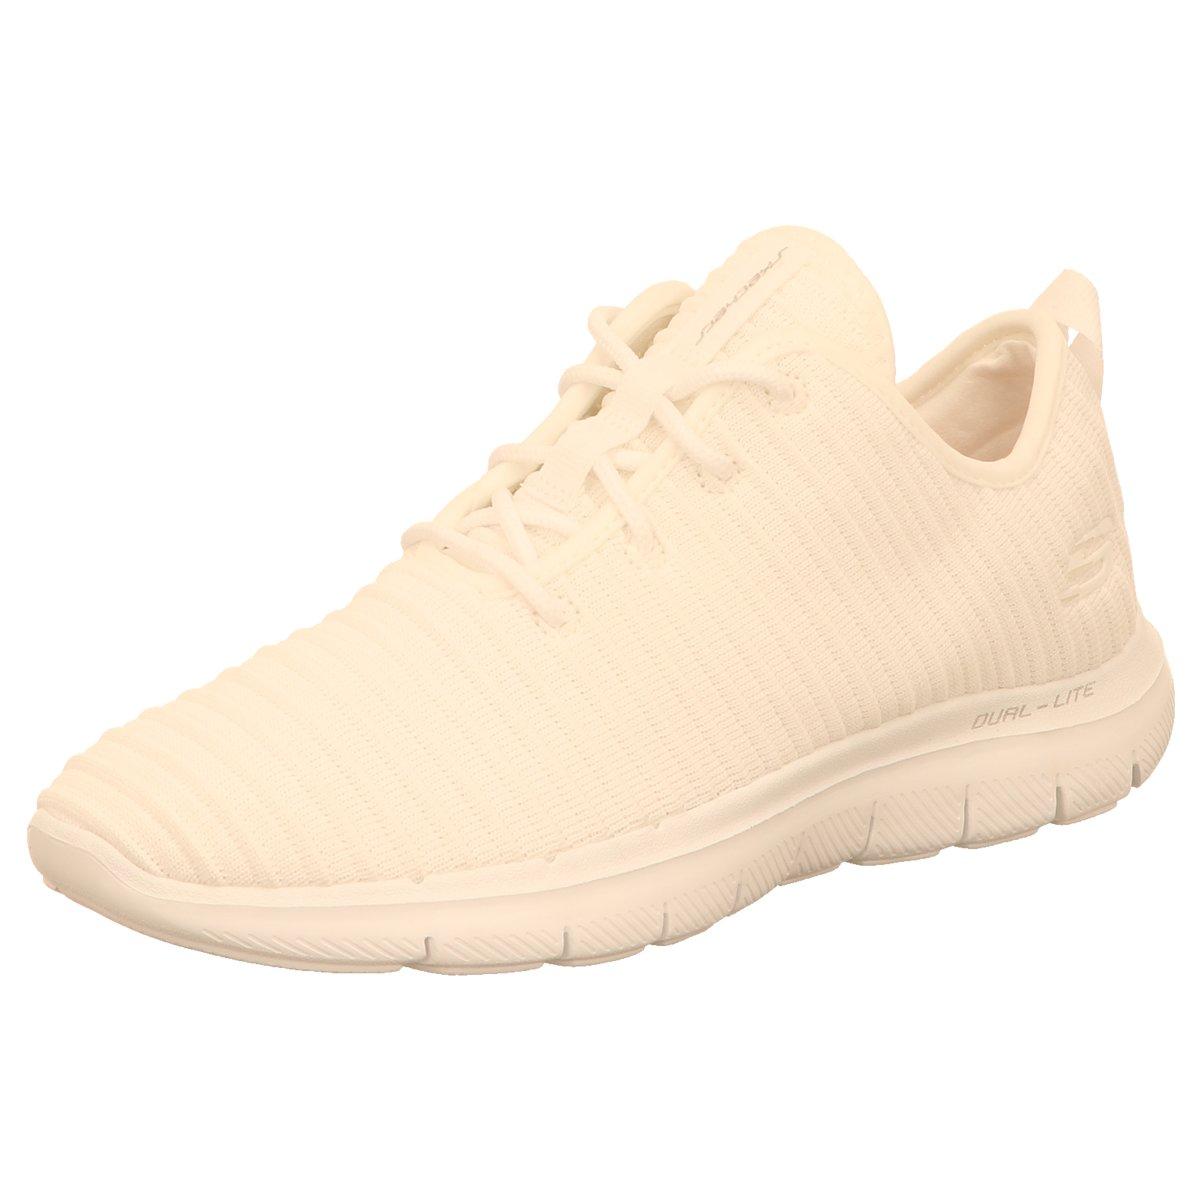 NEU Skechers Damen Sneaker FLEX BPPEBL 2.0 - ESTBTES 12899 WHT WHT weiß 407702